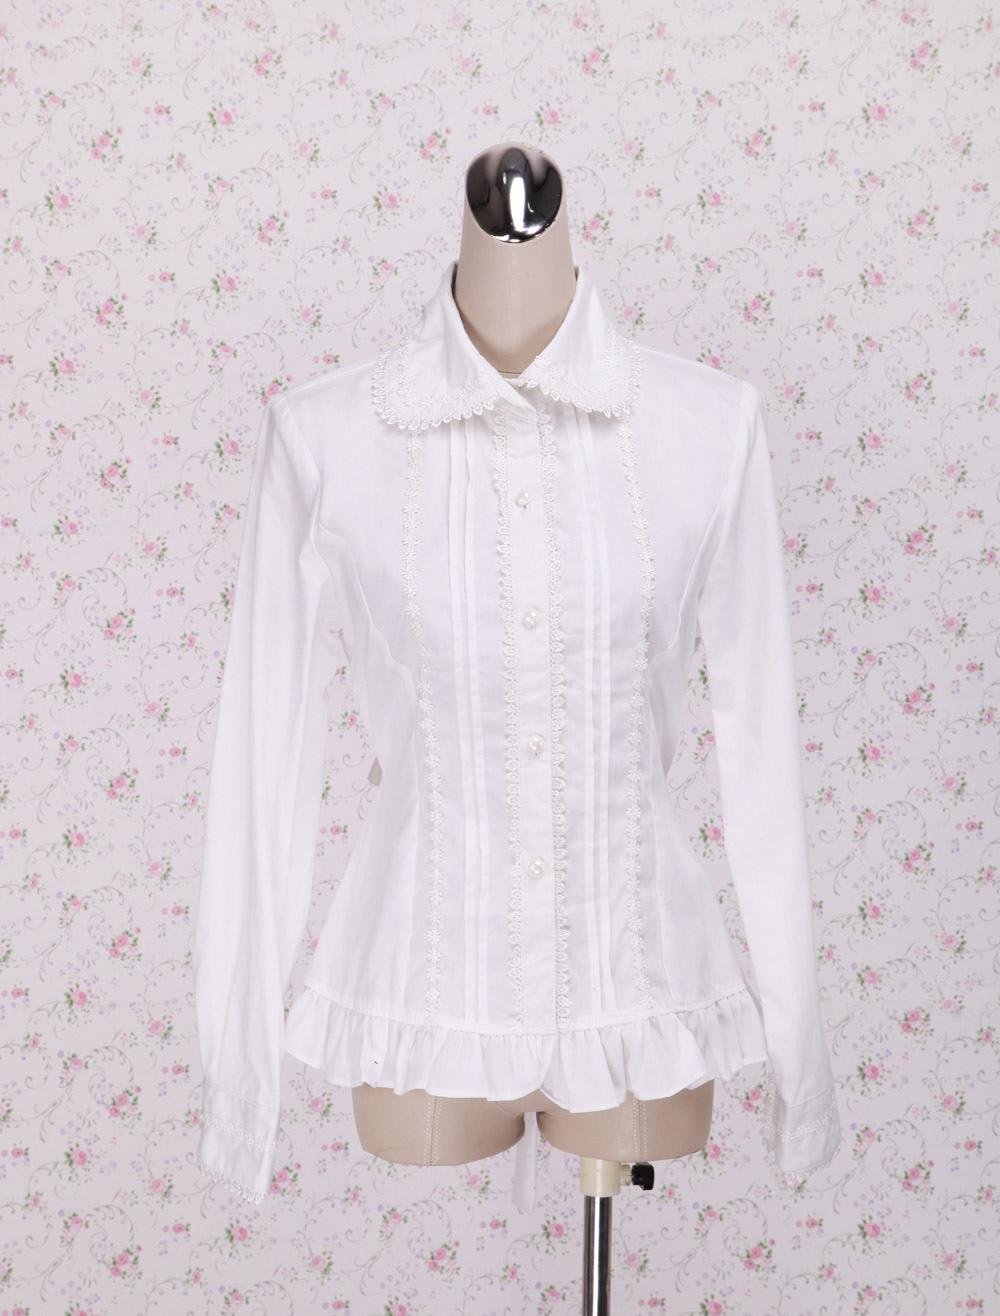 White Cotton Lolita Blouse Long Sleeves Waist Belt Ruffles Trim